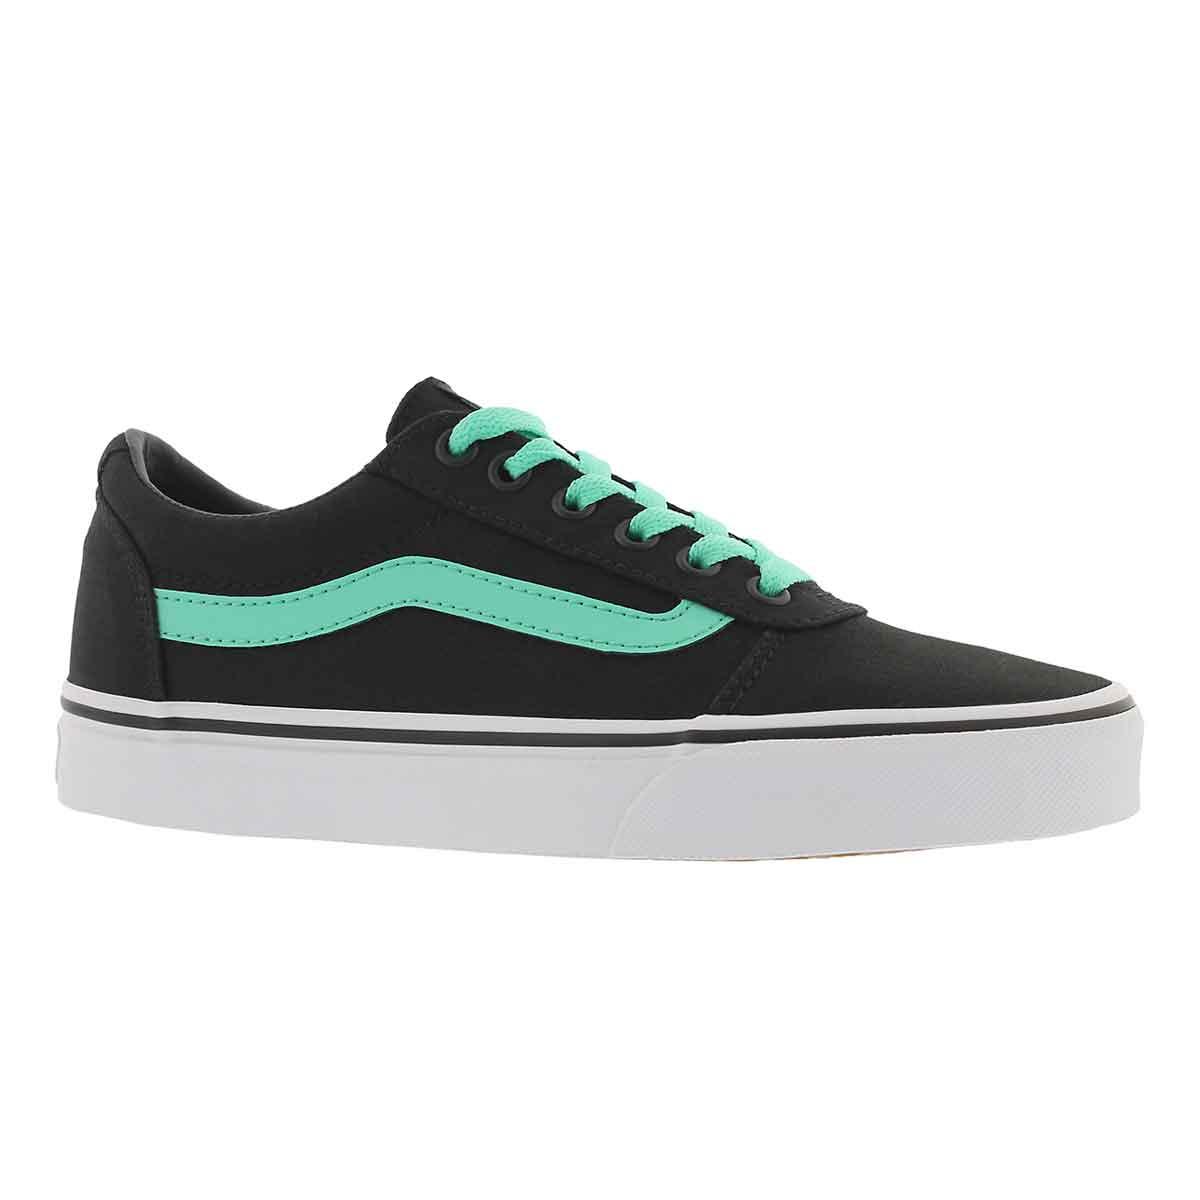 Women's WARD black/green lace up sneakers